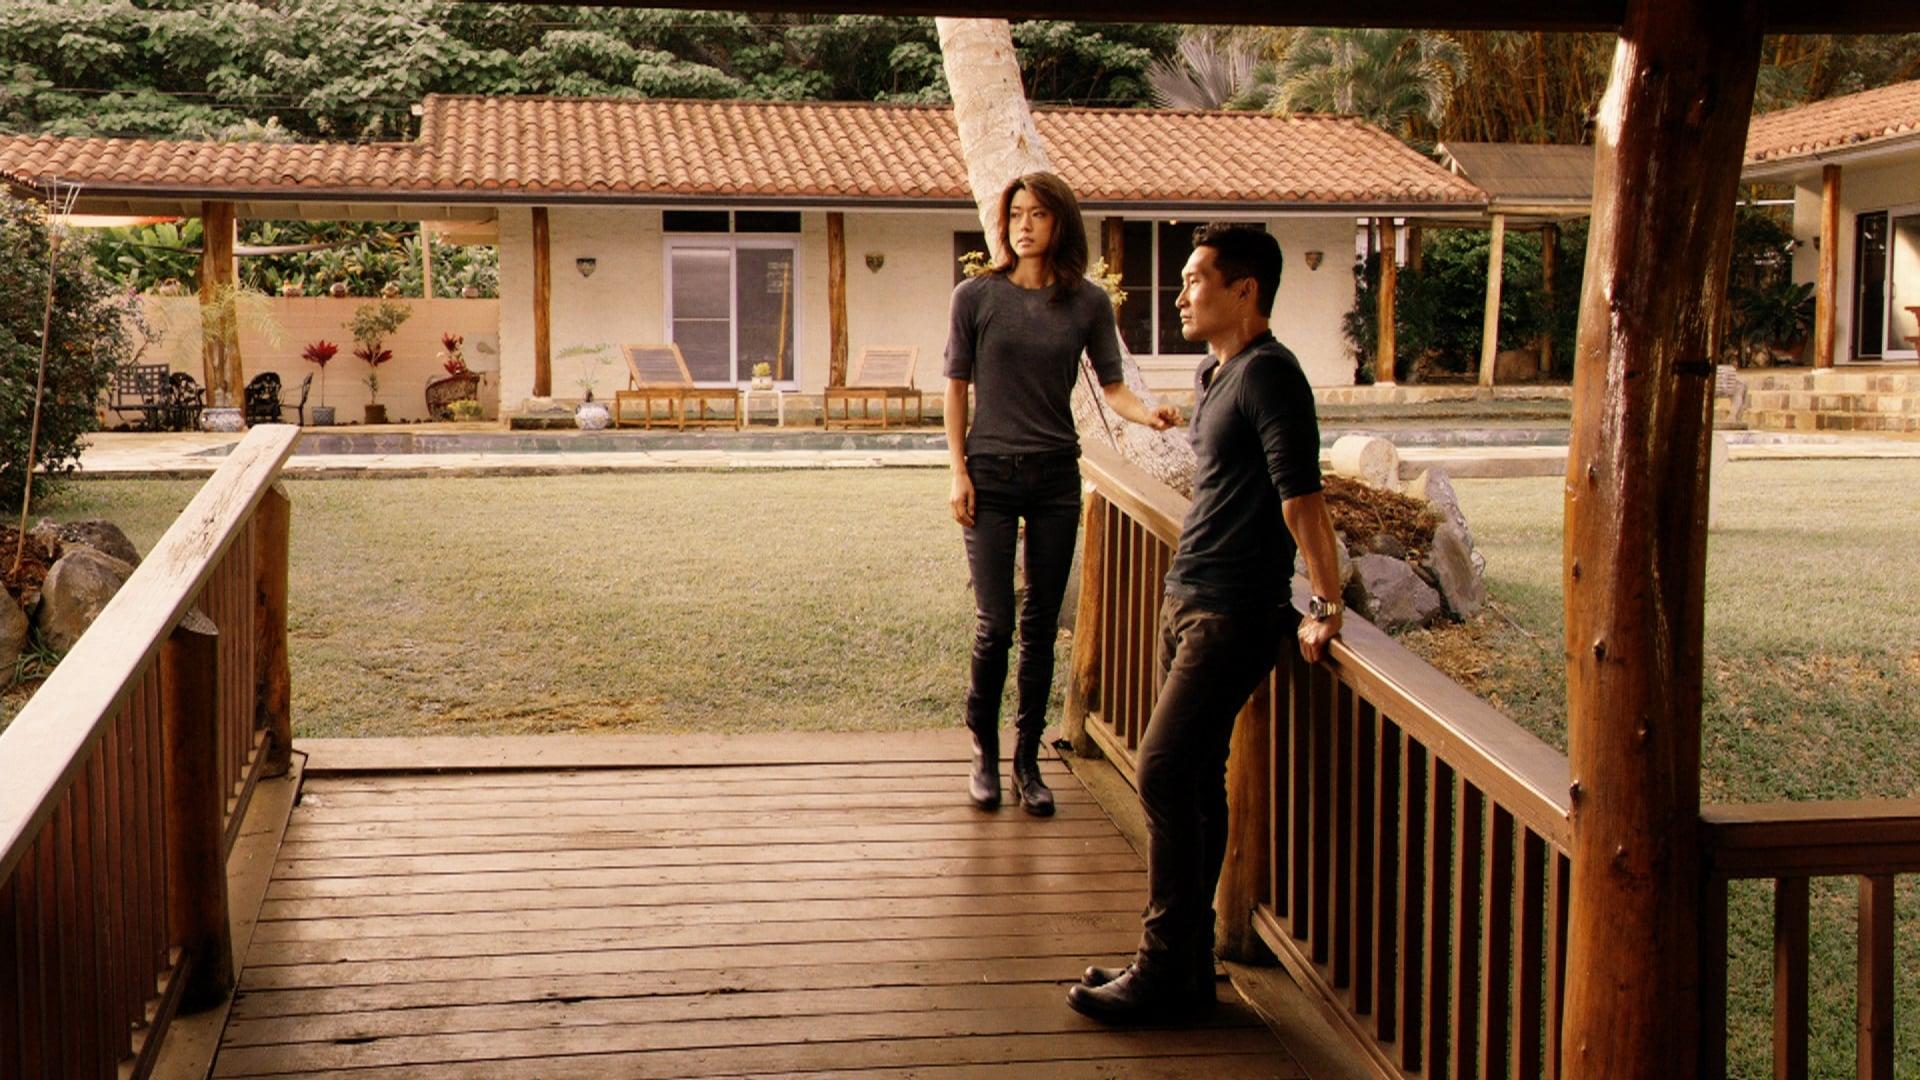 Hawaii Five-0 - Season 7 Episode 11 : Ka'ili aku (Snatchback)